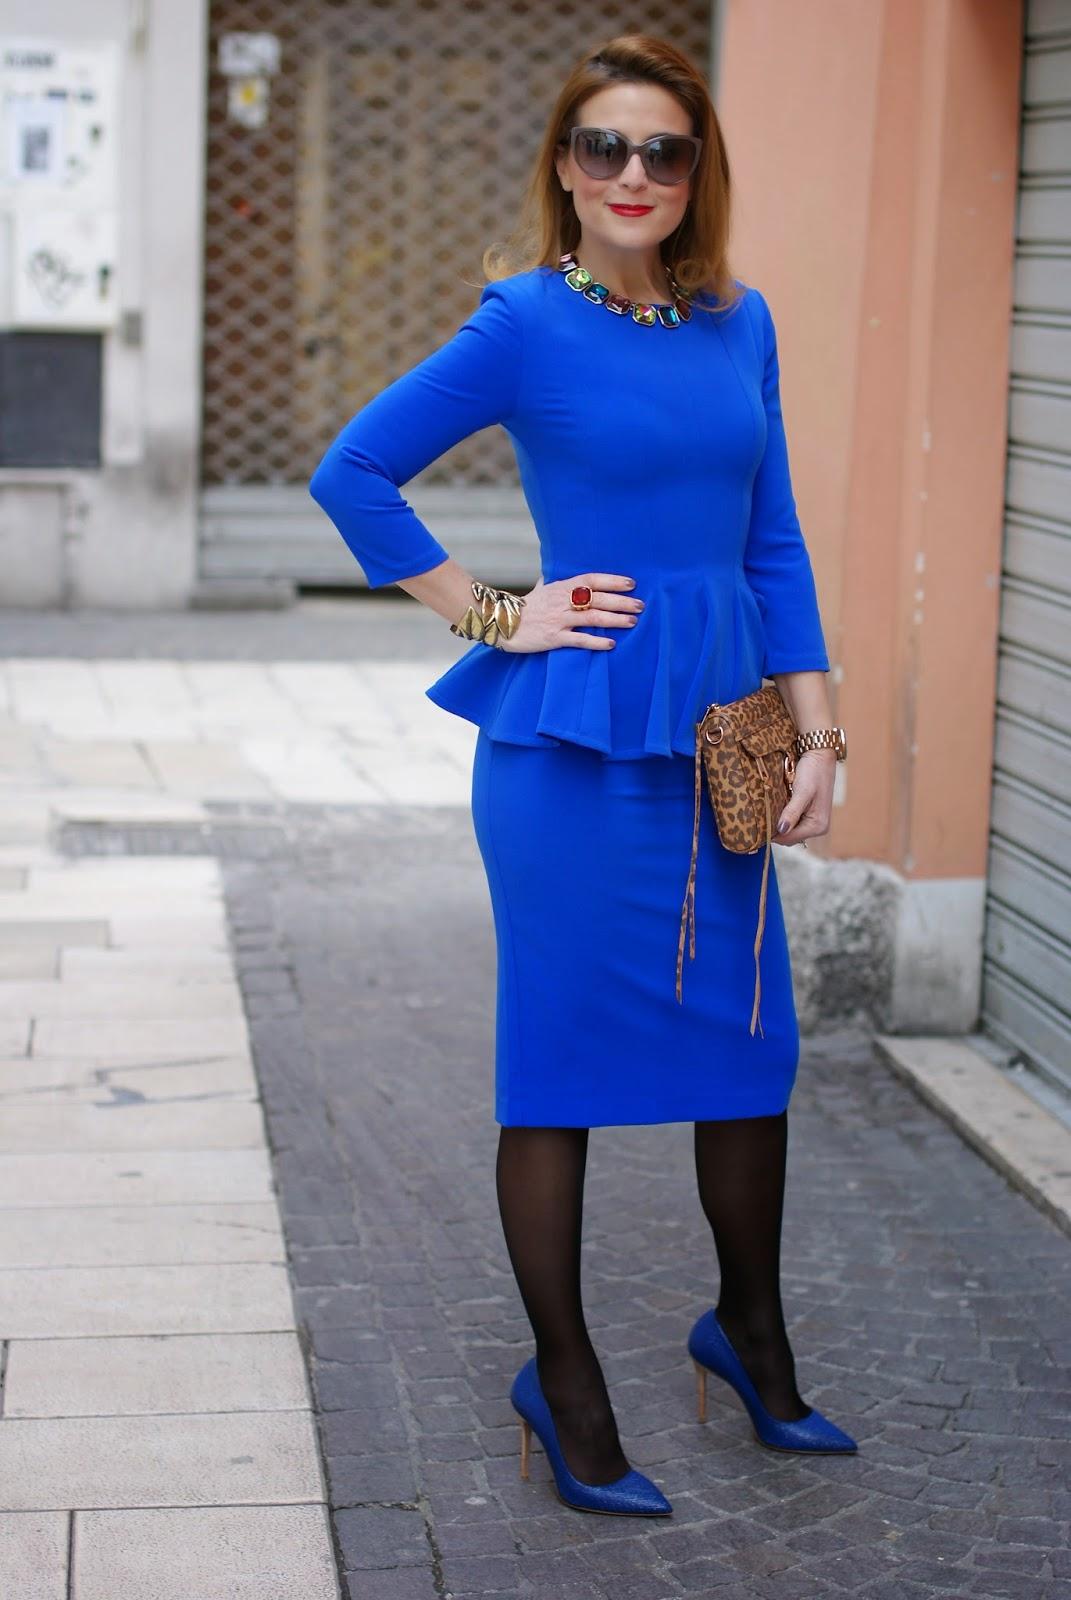 Isabel Garcia peplum dress with midi skirt, sheer tights with heels, Rebecca Minkoff mini MAC clutch in leopard, Fashion and Cookies fashion blog, fashion blogger